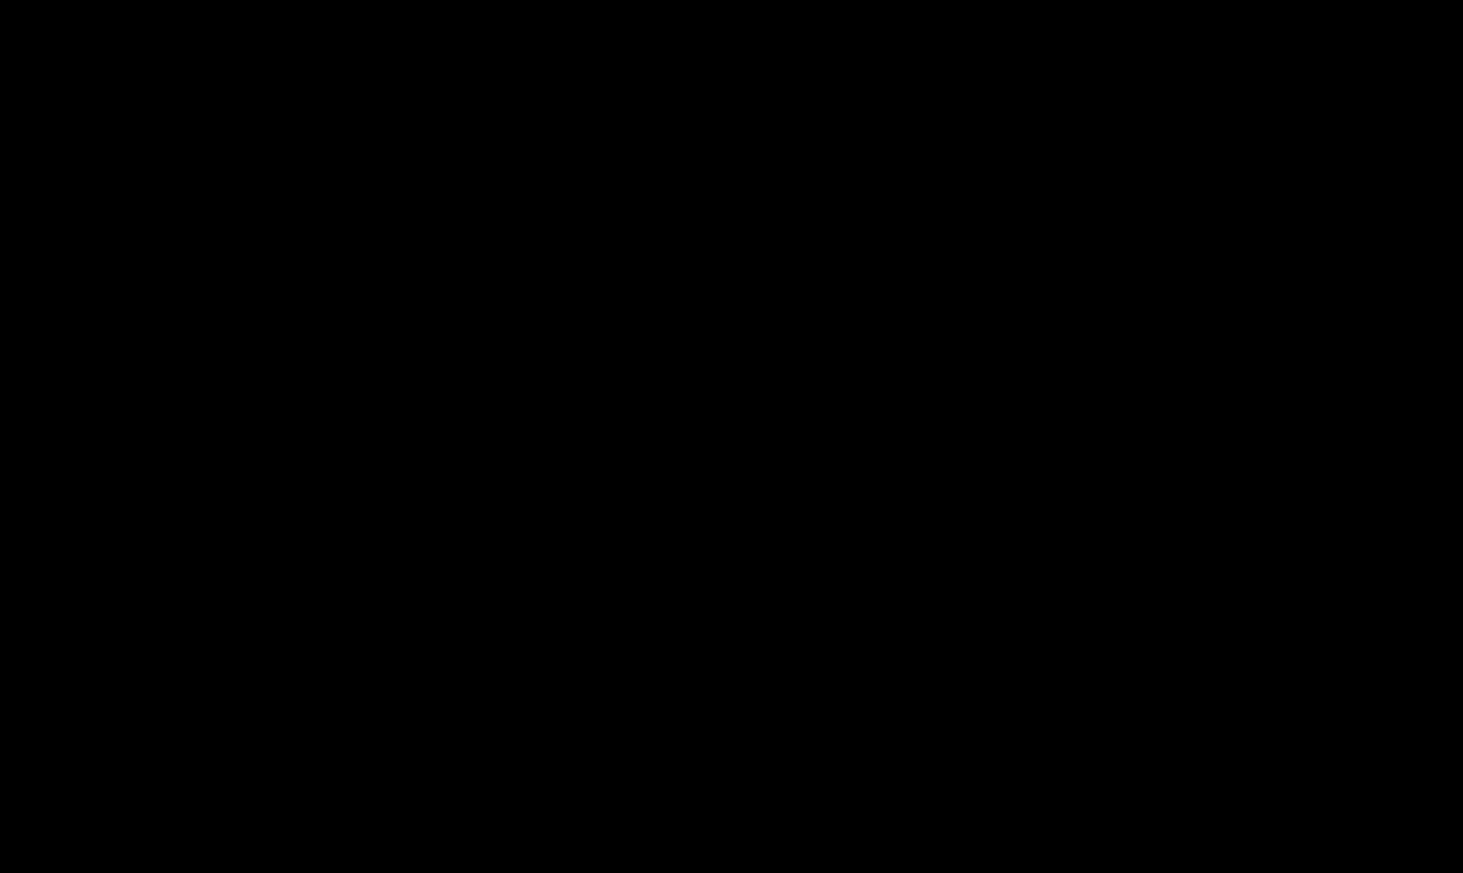 DBCO-dPEG®₂₄-MAL